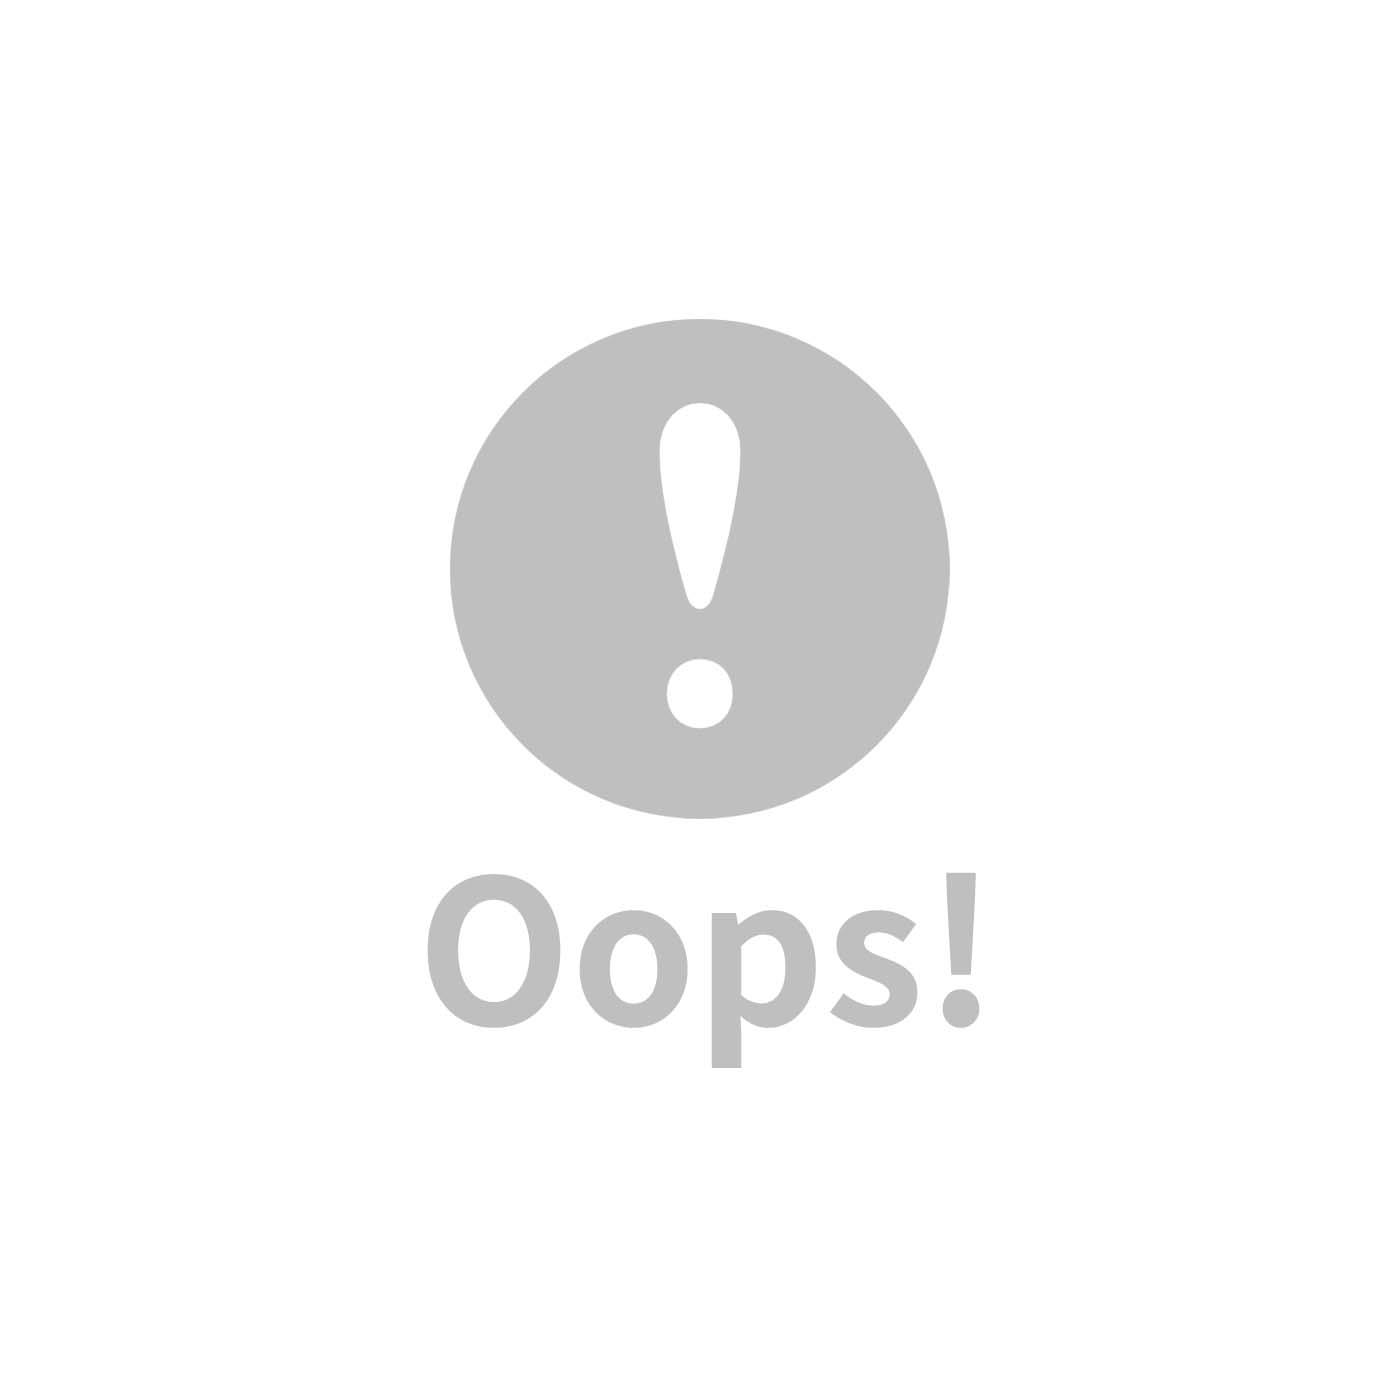 Pacific Baby 美國不鏽鋼保溫太空瓶7oz+4oz二入學習喝水組(勇氣藍7oz+親切藍4oz+藍學習配件)